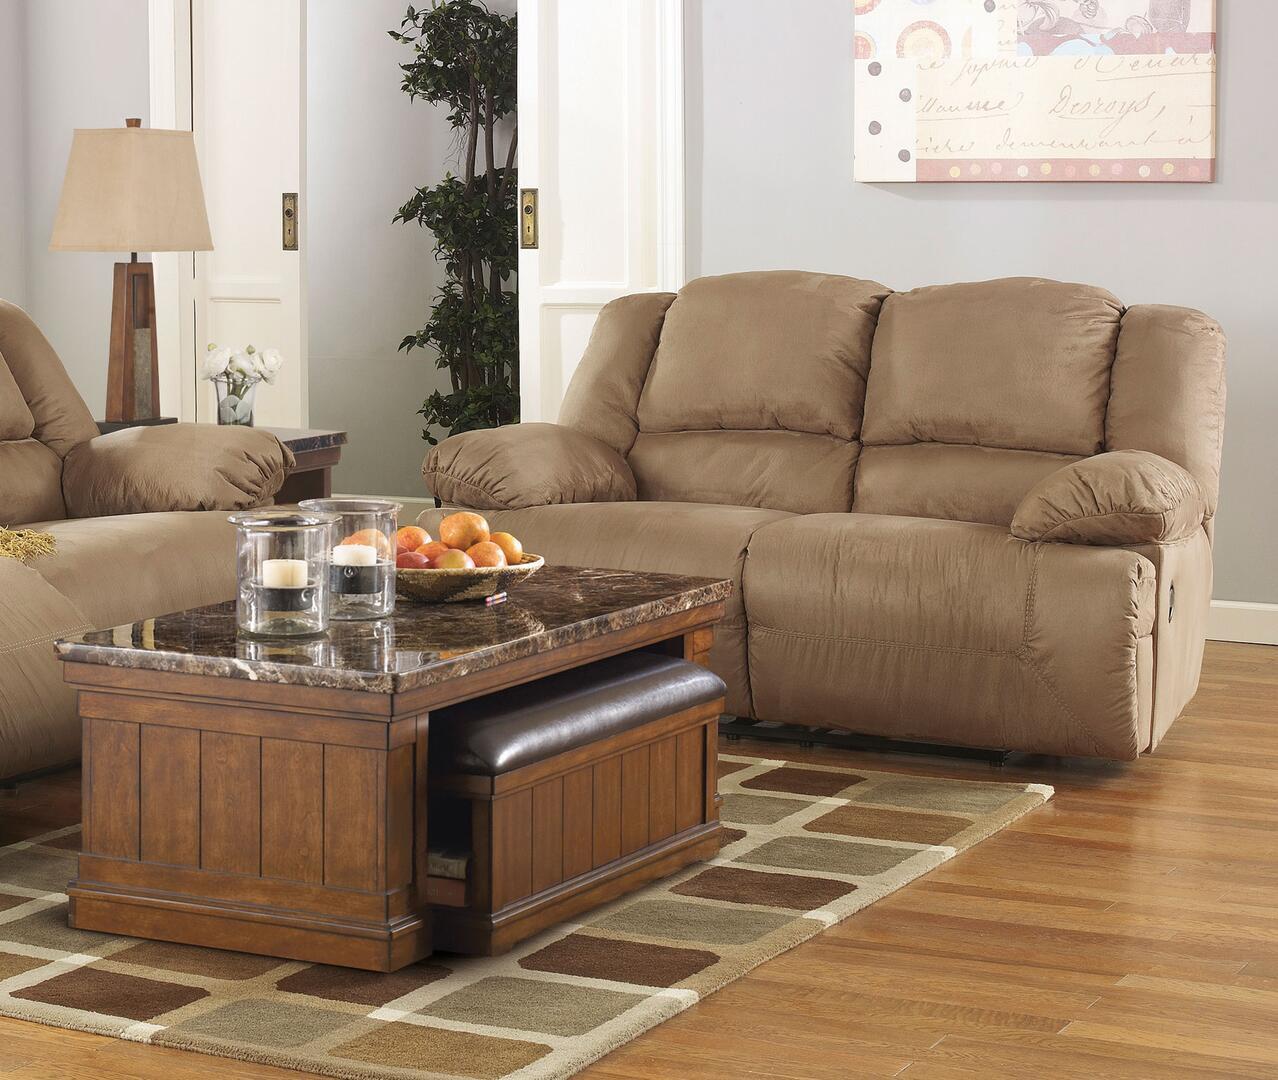 Ashleys Furniture Com: Signature Design By Ashley 5780286 Kaitlyn Series